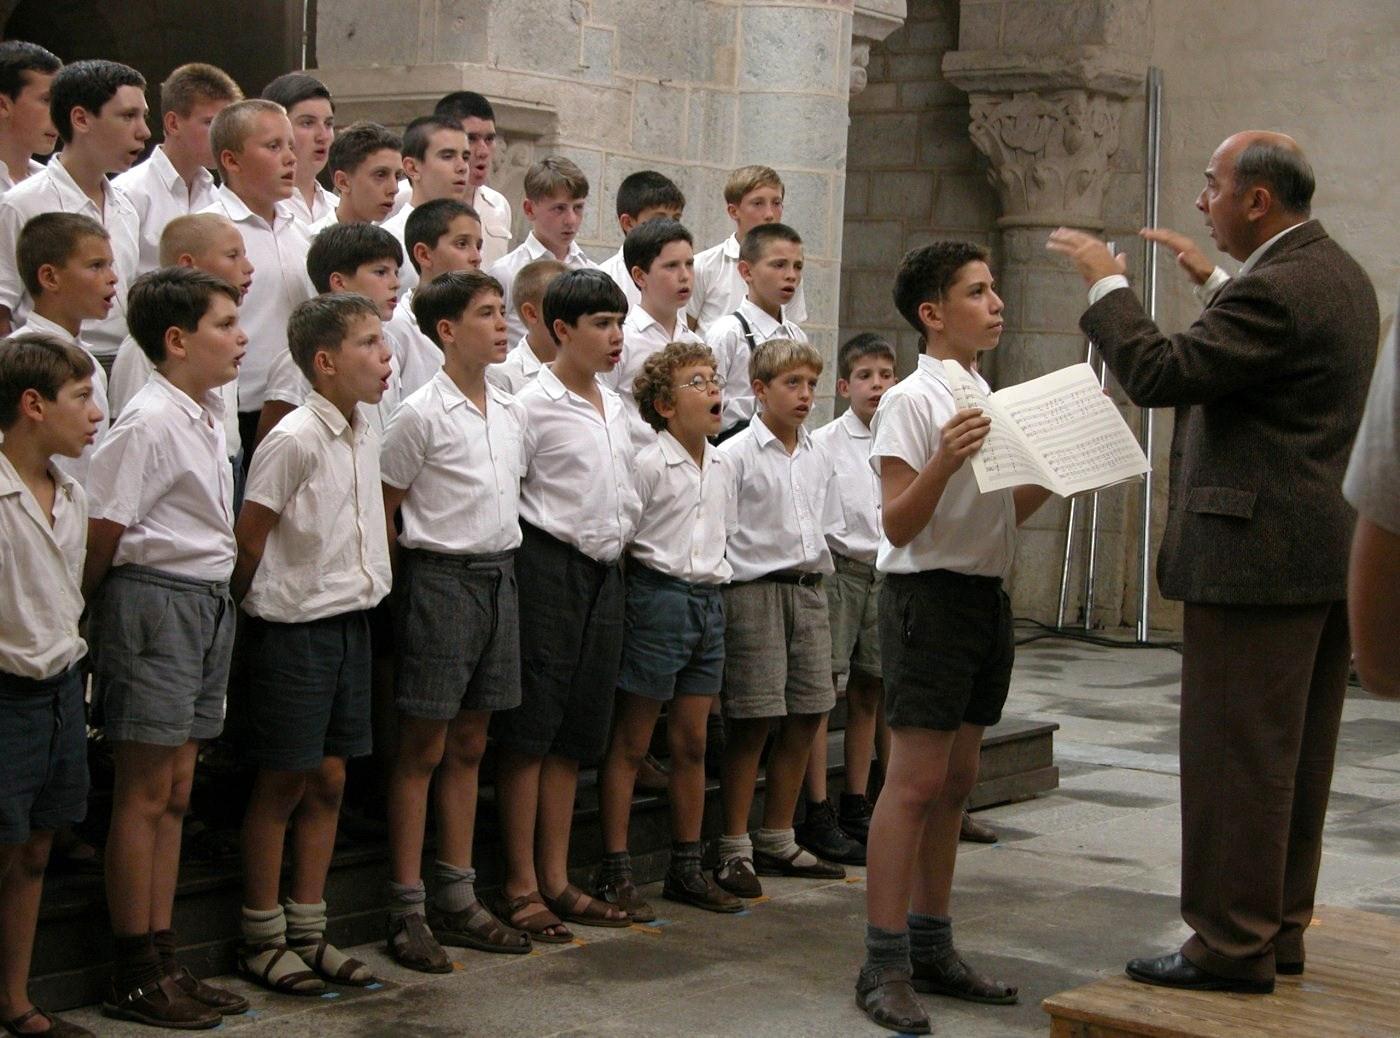 Chicos del coro online follar abuela Córdoba-85152